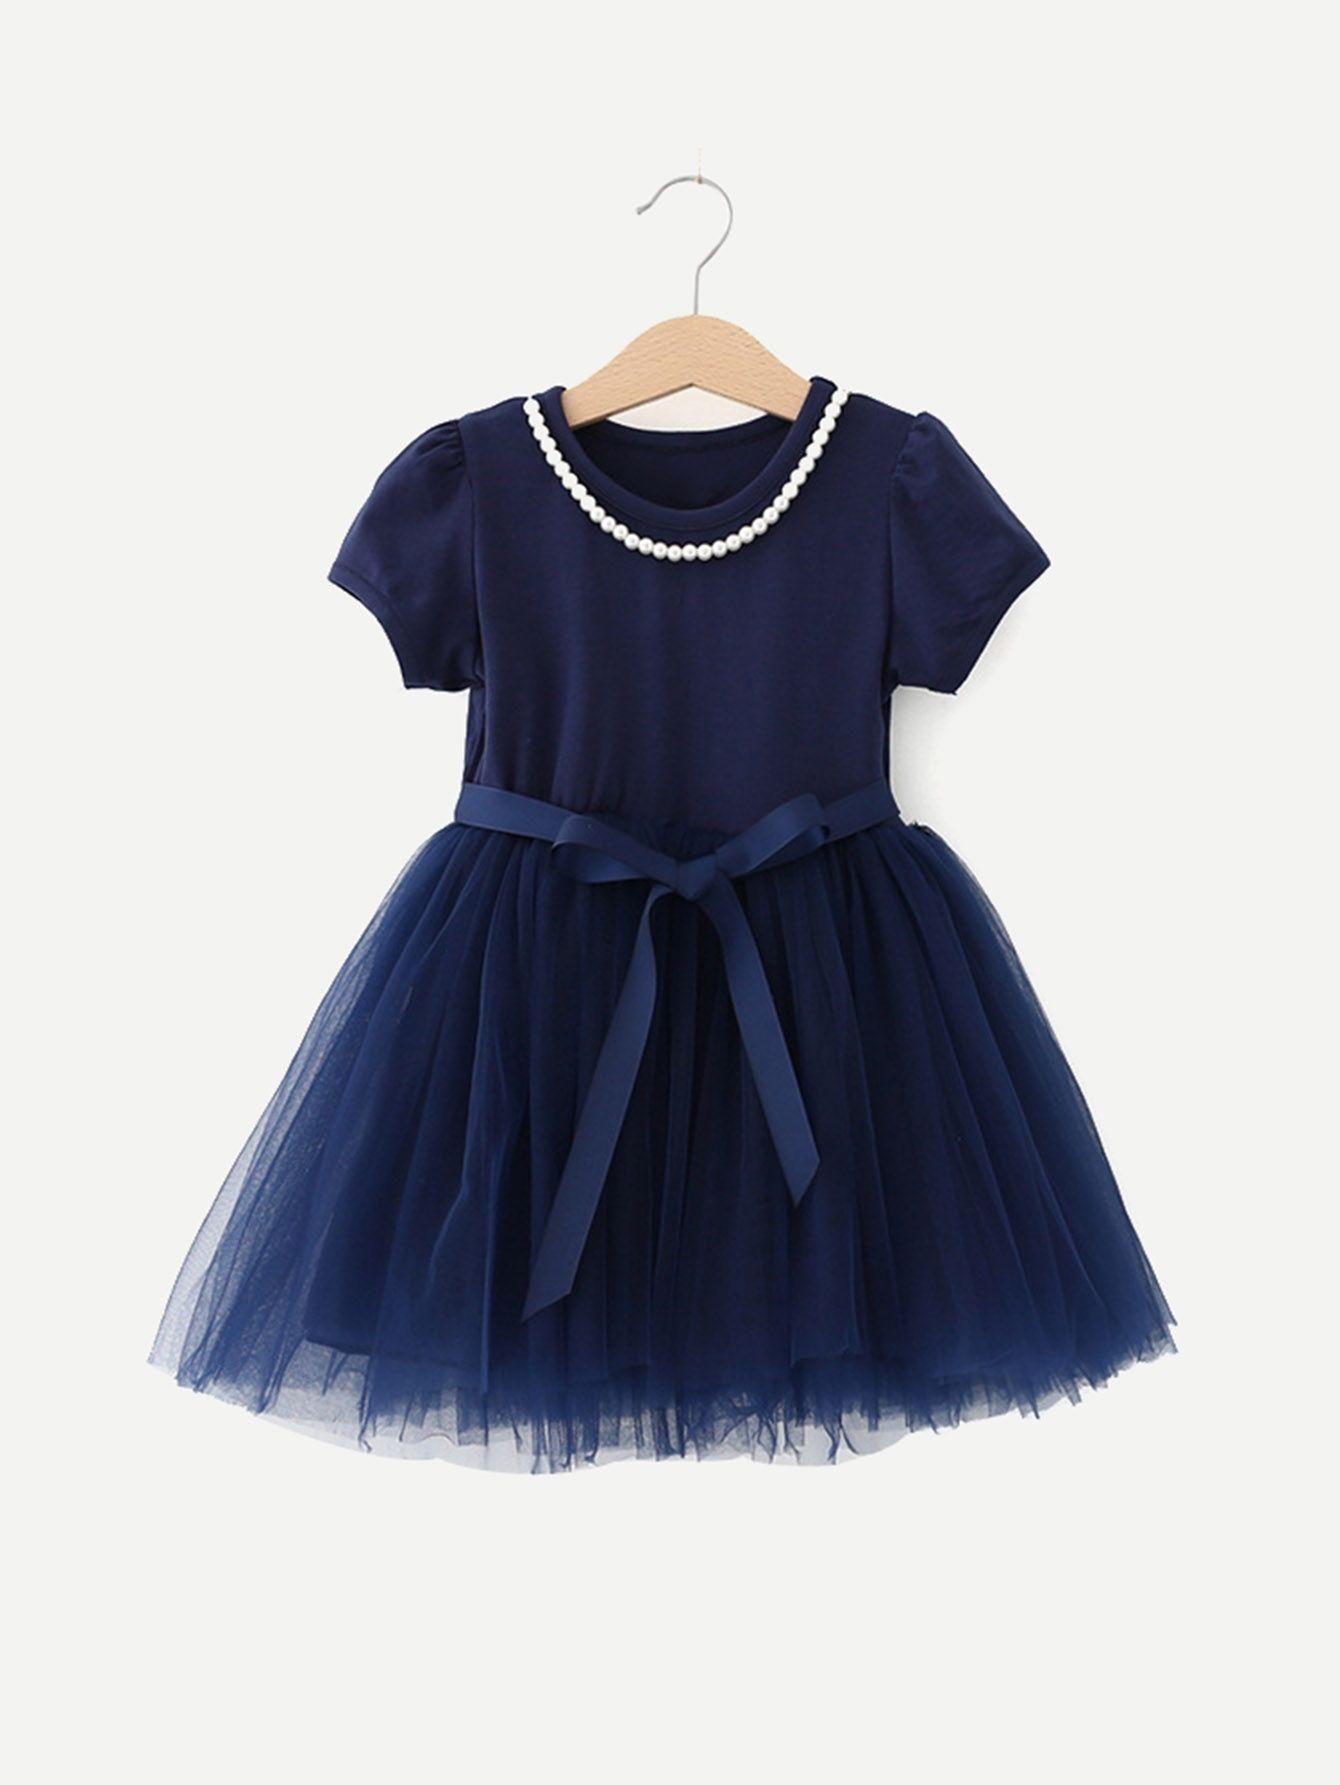 afb0bf5ebc861 SHEIN Girls Contrast Mesh Tie Detail Pearls Decoration Dress